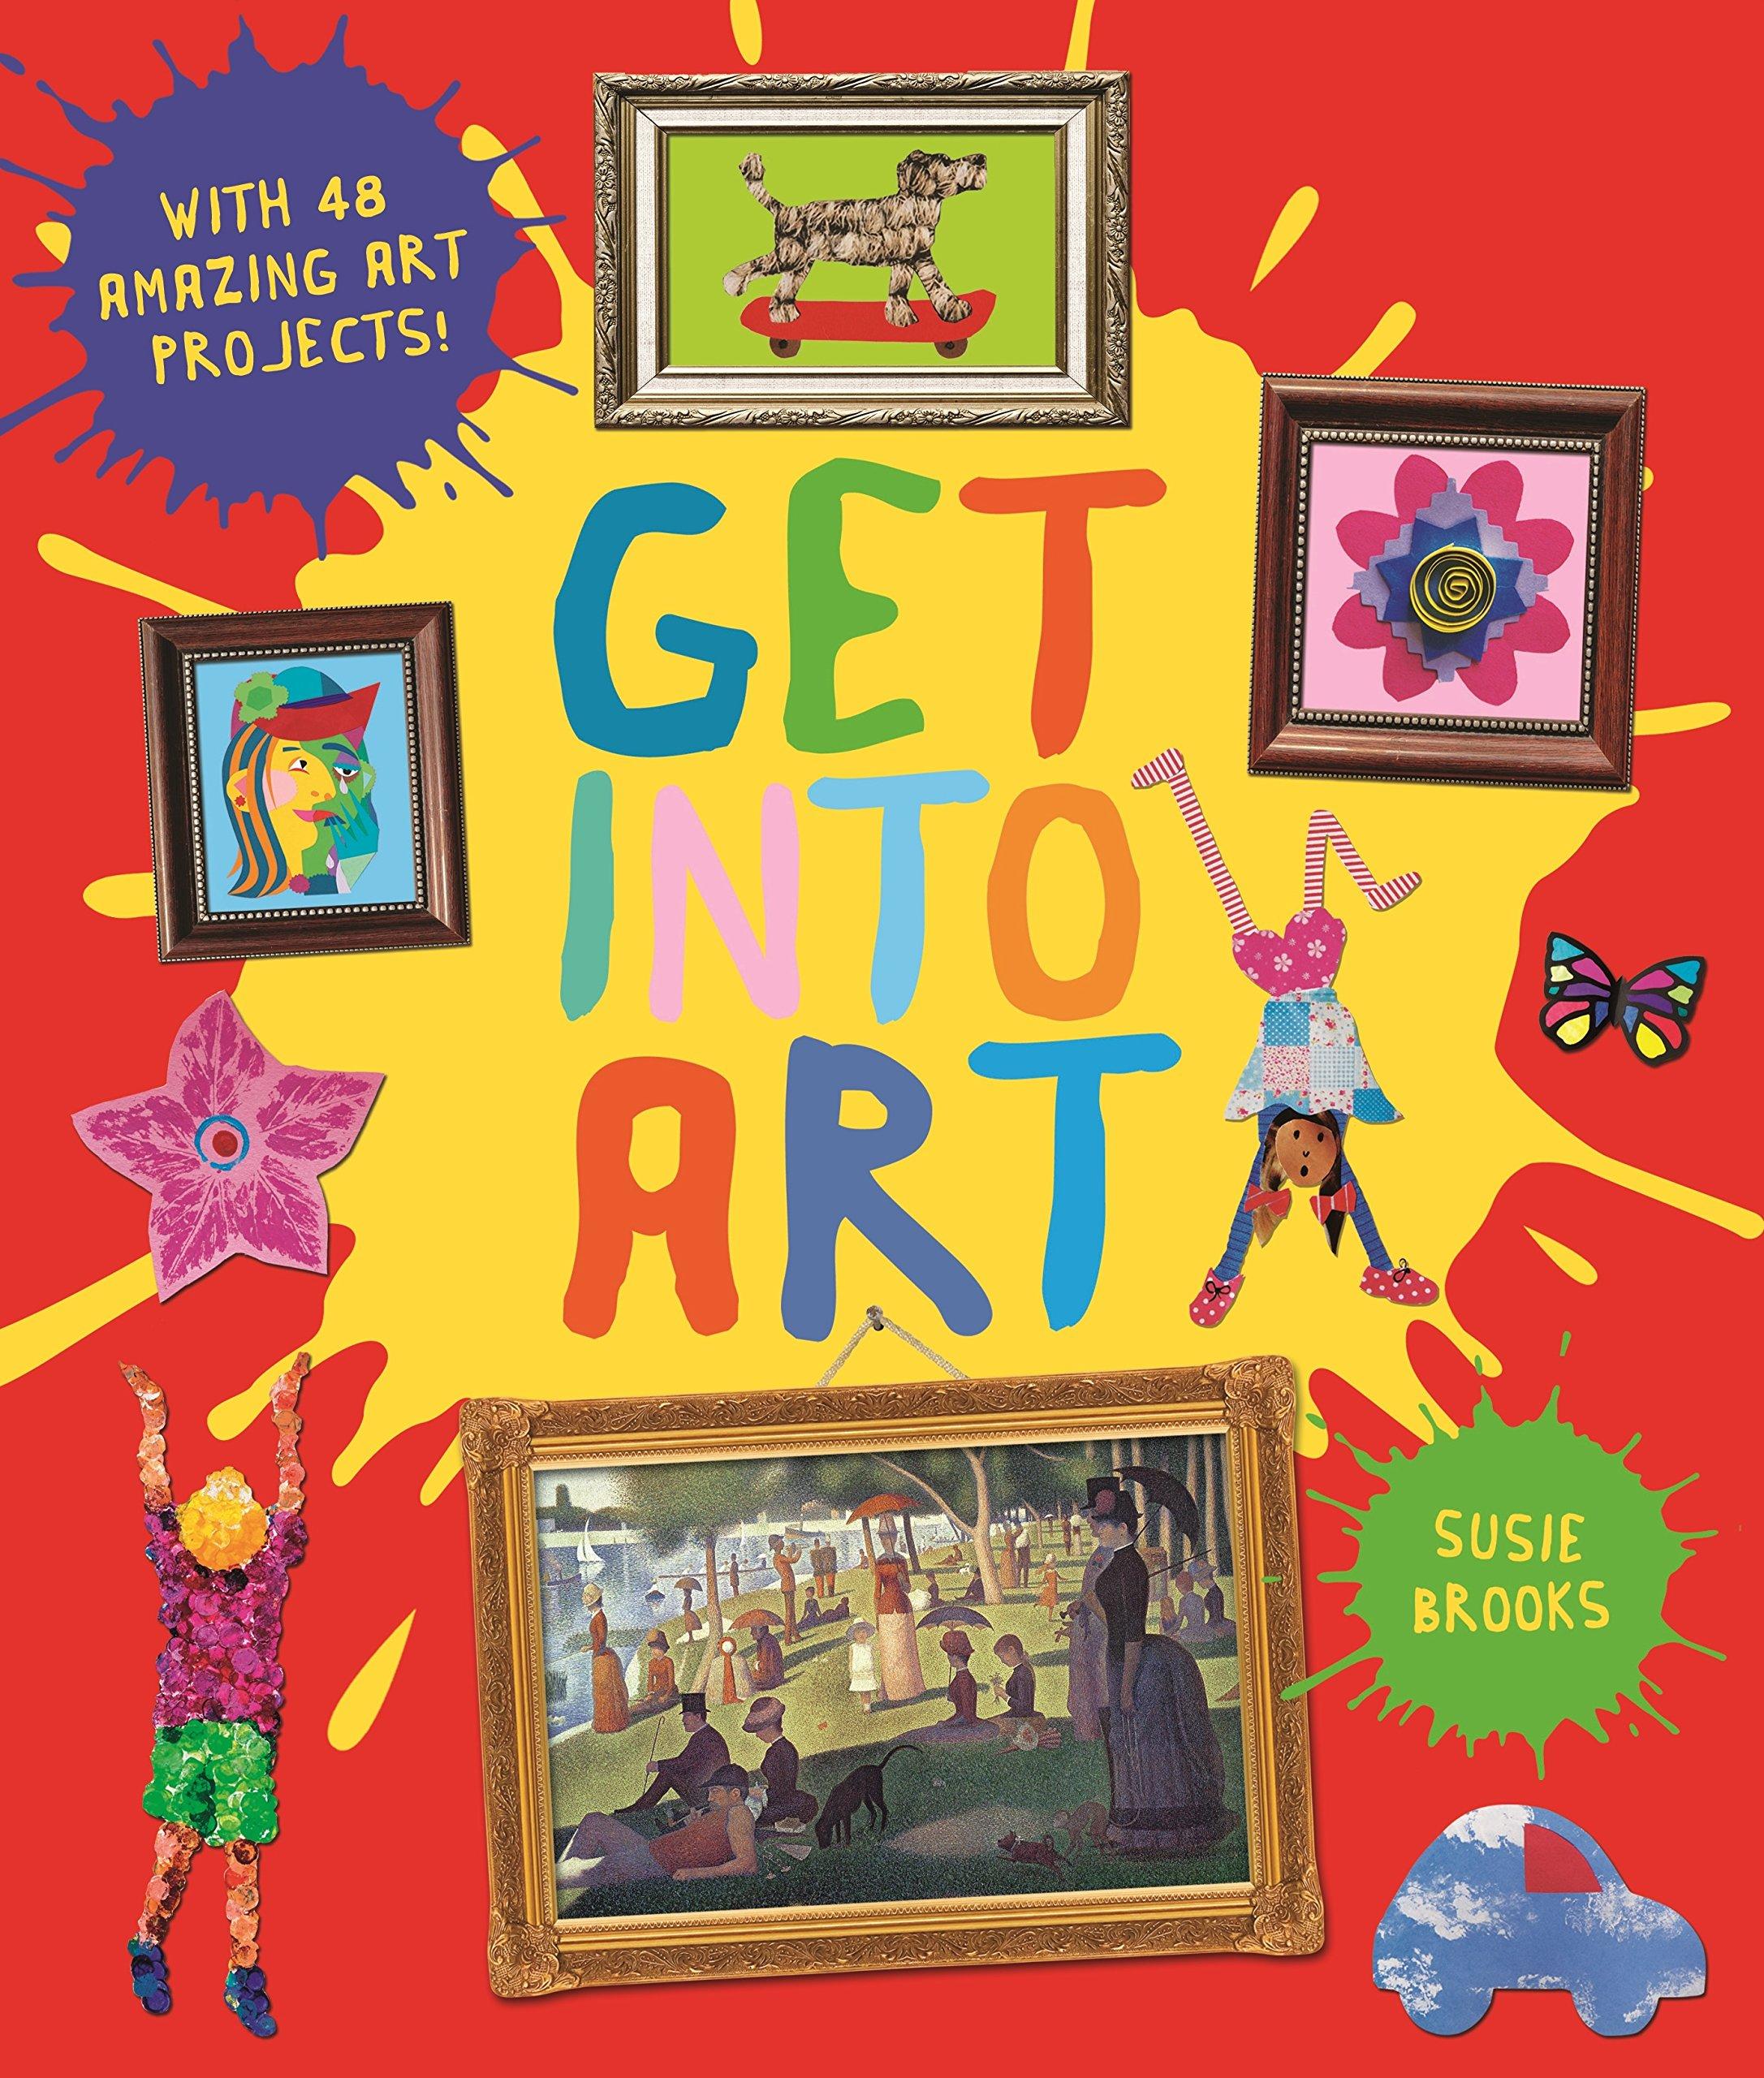 Get into Art